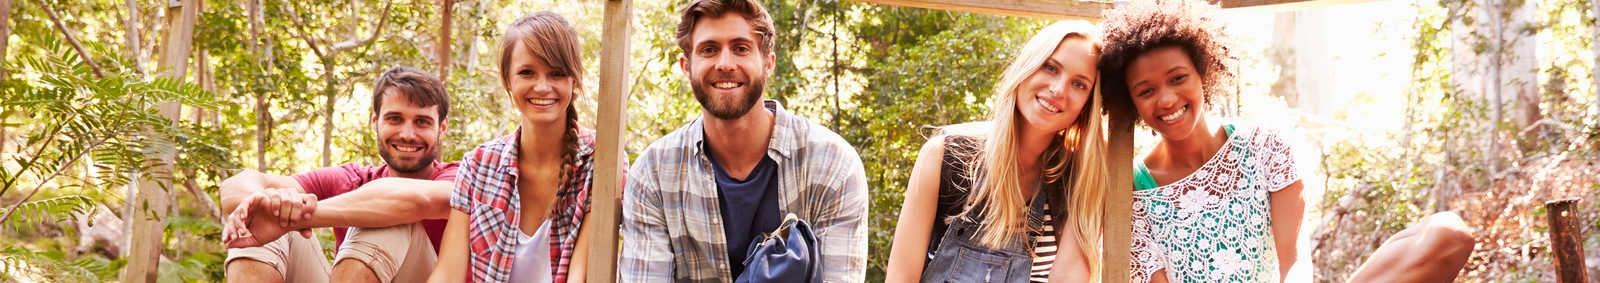 friends sat on a wooden bridge in forest